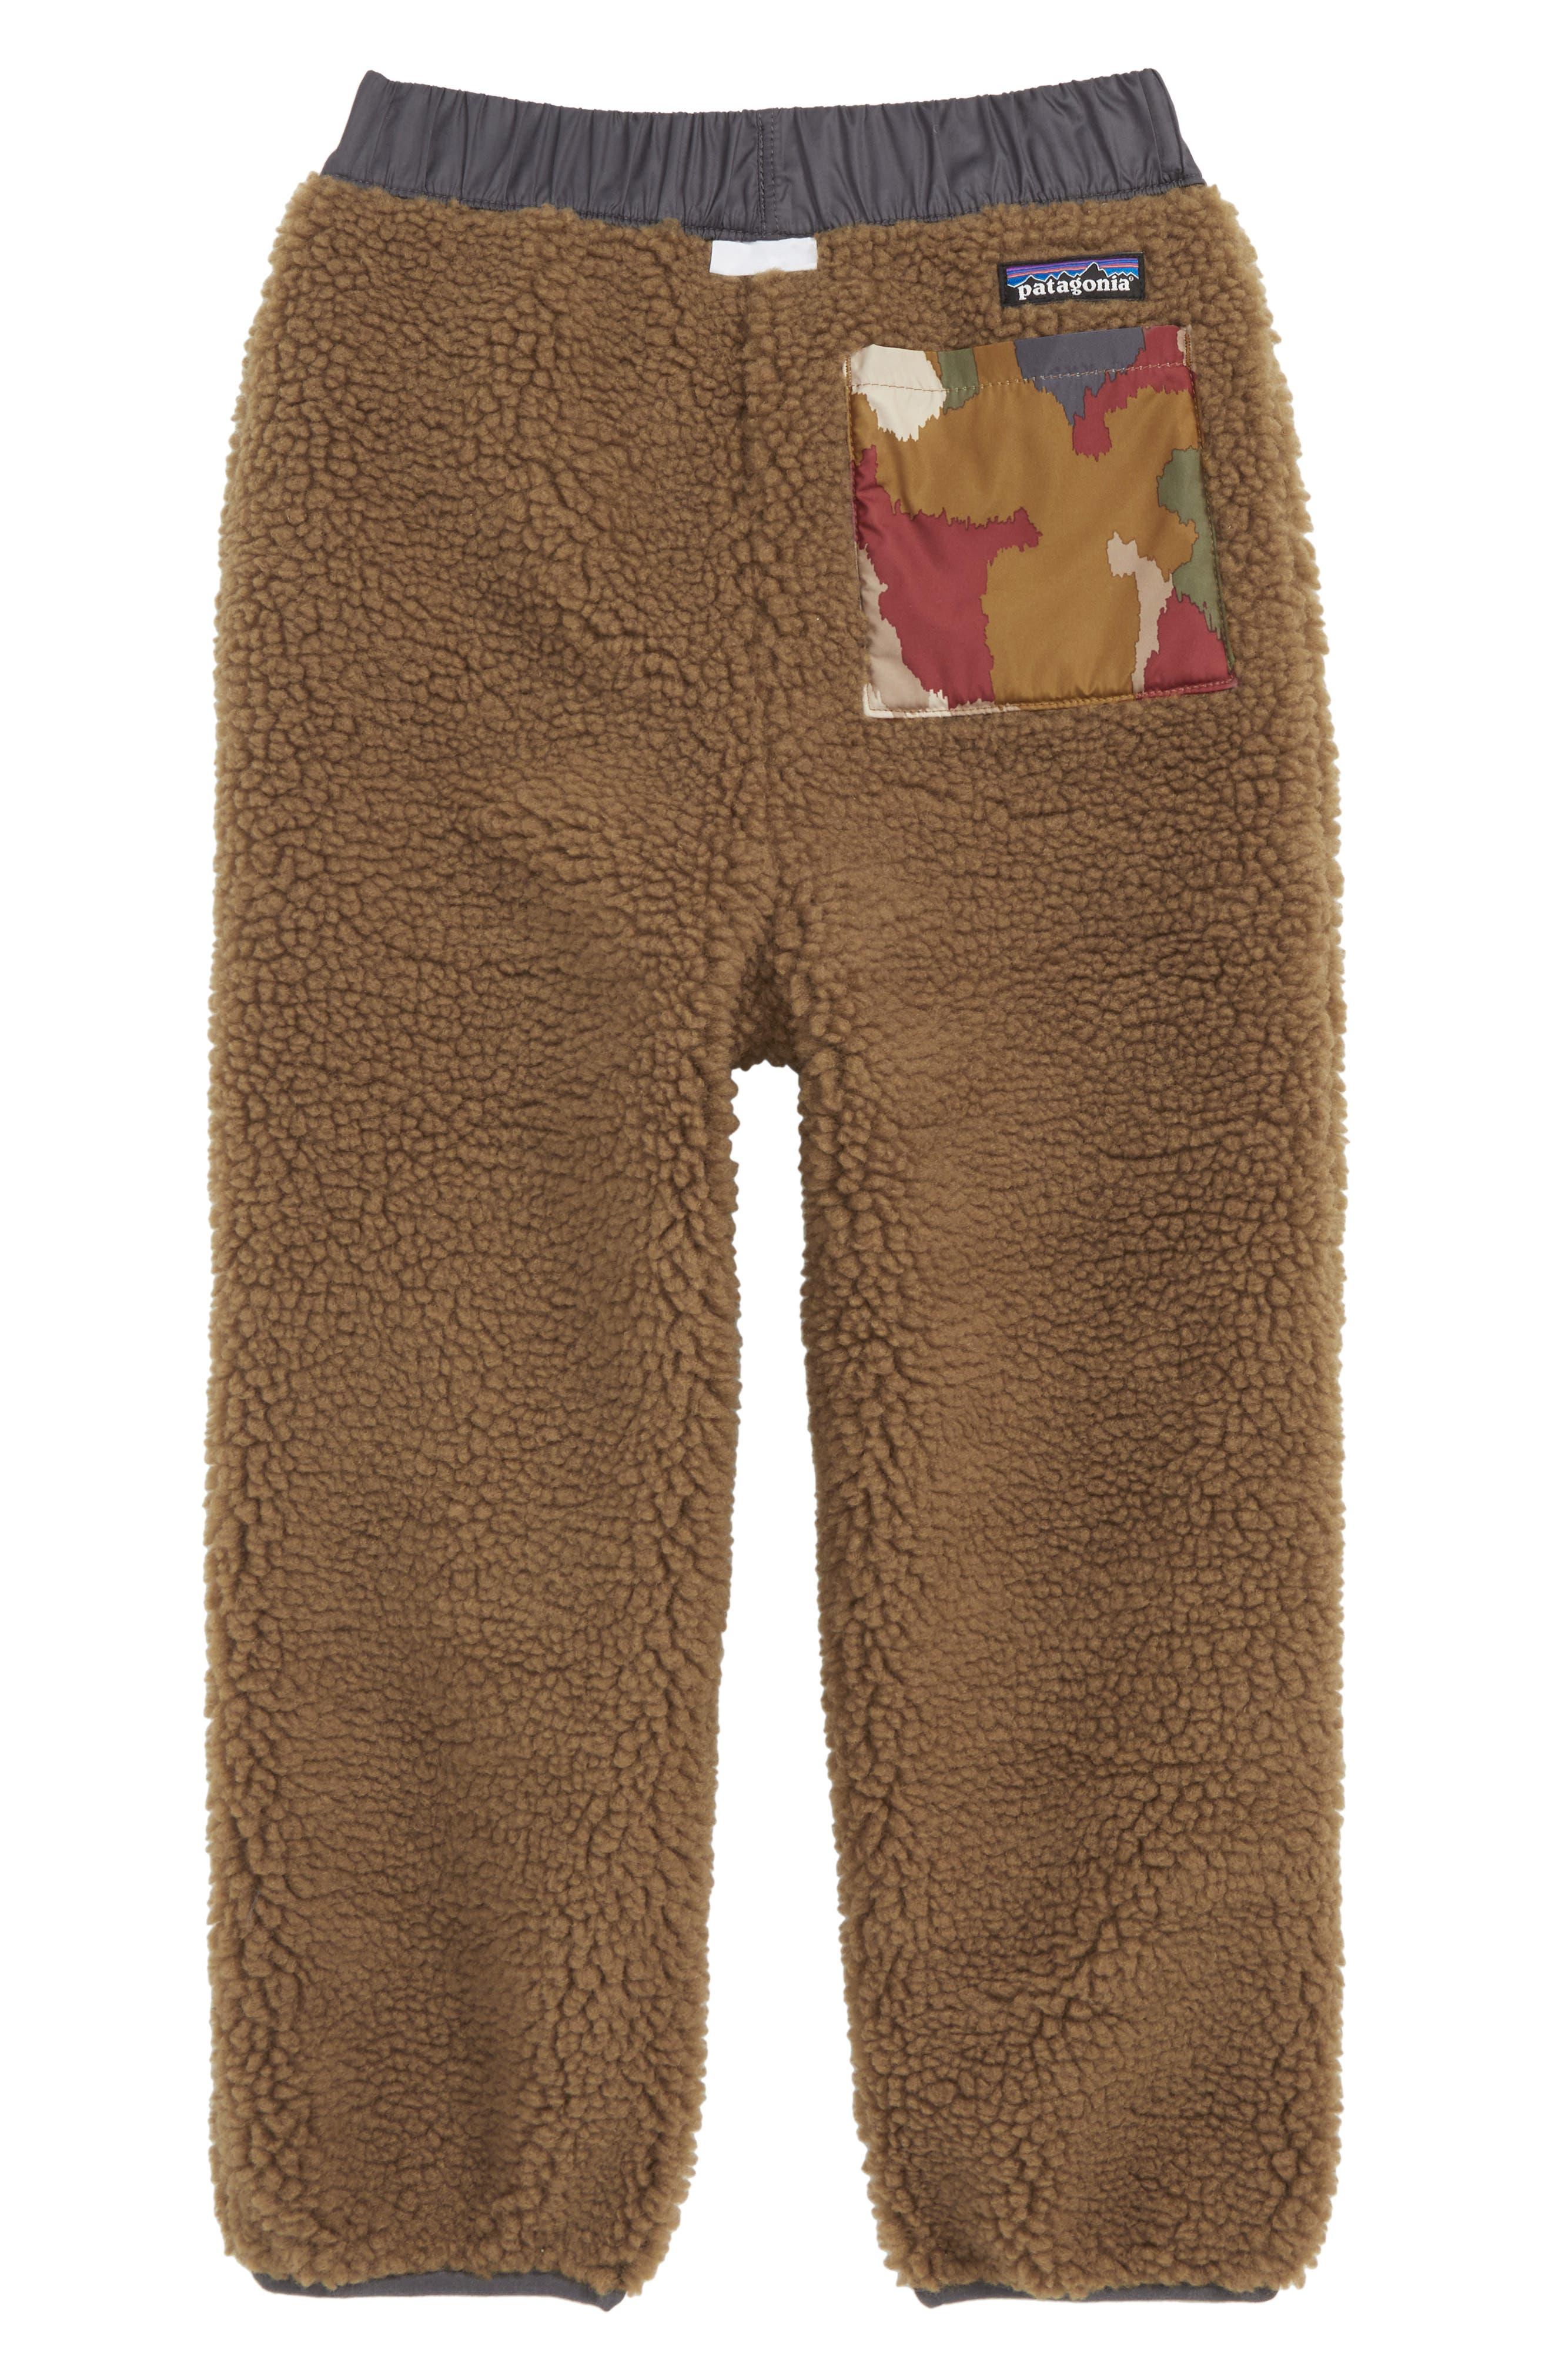 Tribbles Reversible Water Repellent Snow Pants,                             Alternate thumbnail 2, color,                             BCEL BUNKER CAMO: EL CAP KHAKI